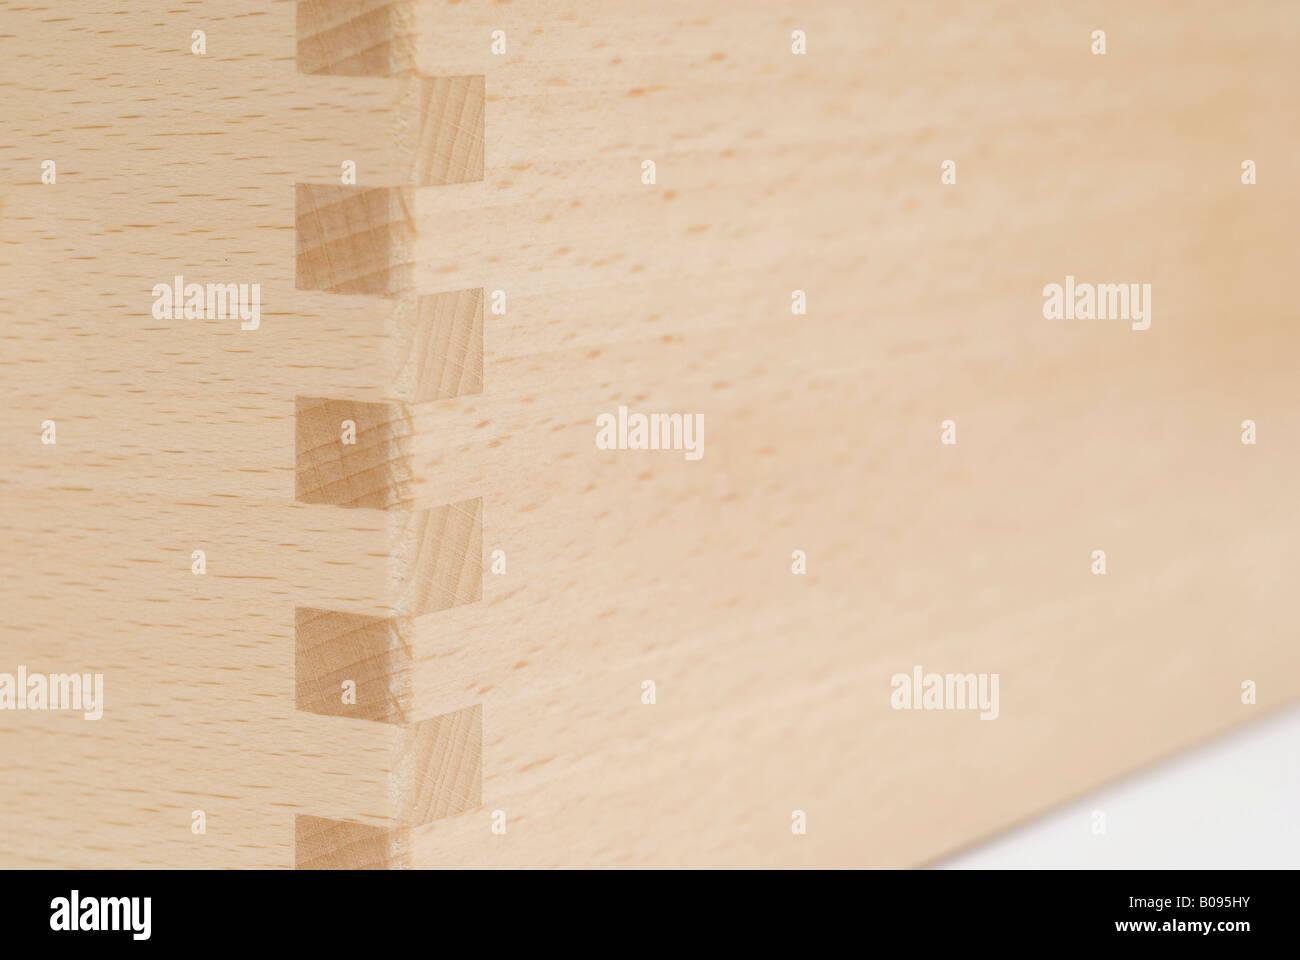 Dowel Joint Of Beechwood Boards Stock Photo 17412359 Alamy